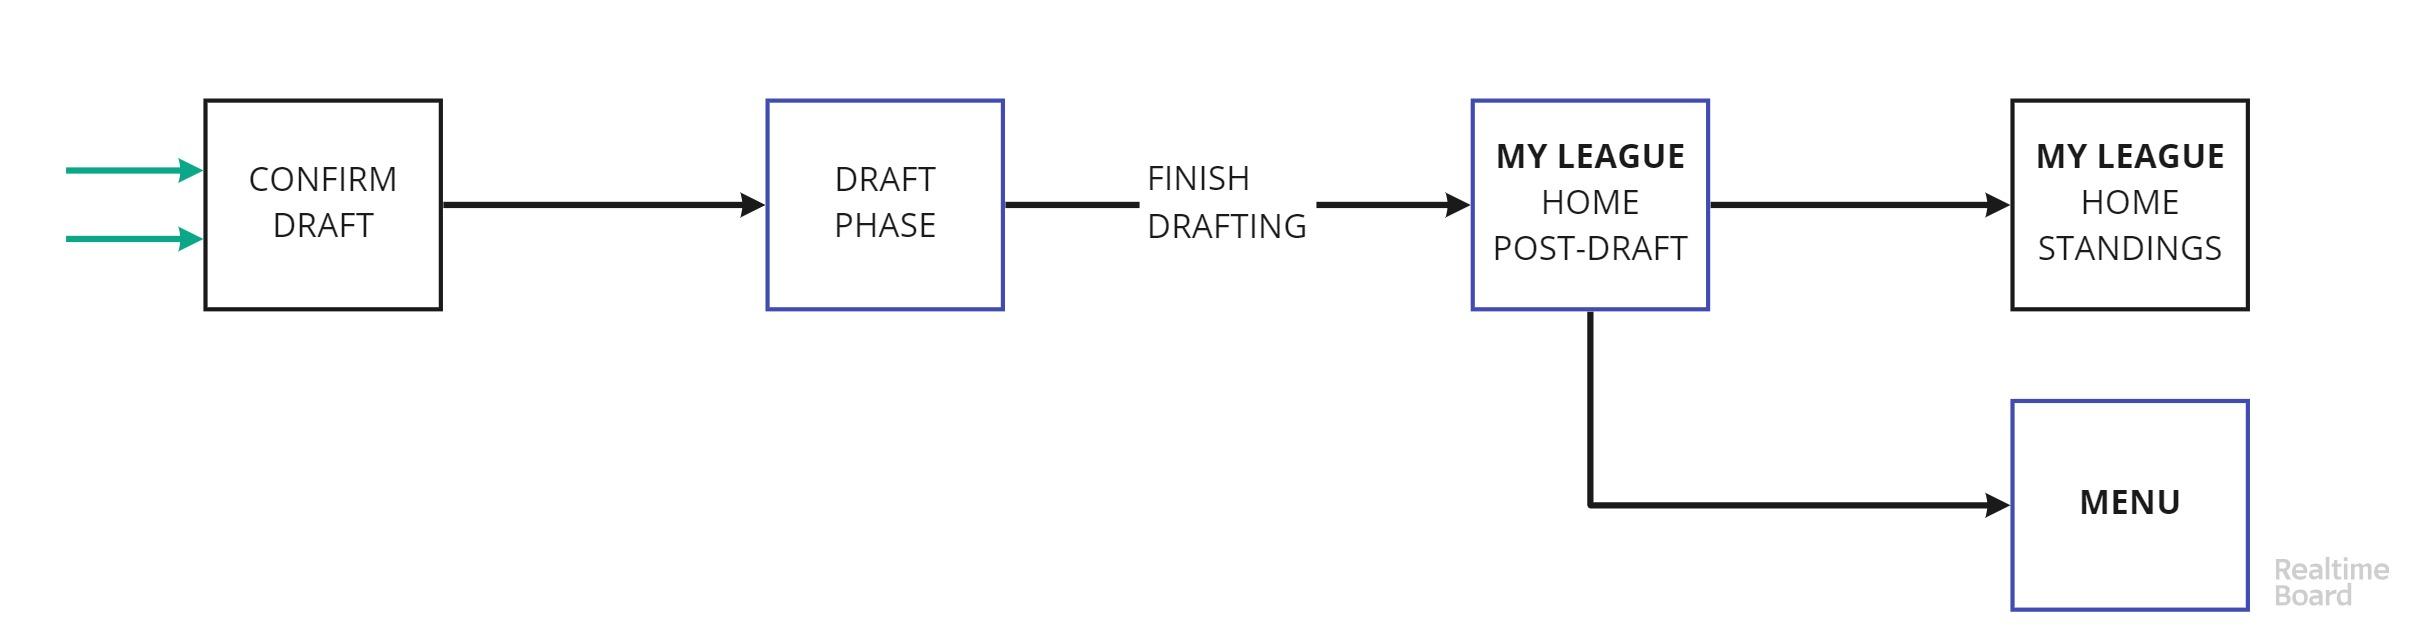 Draft & Post-Draft